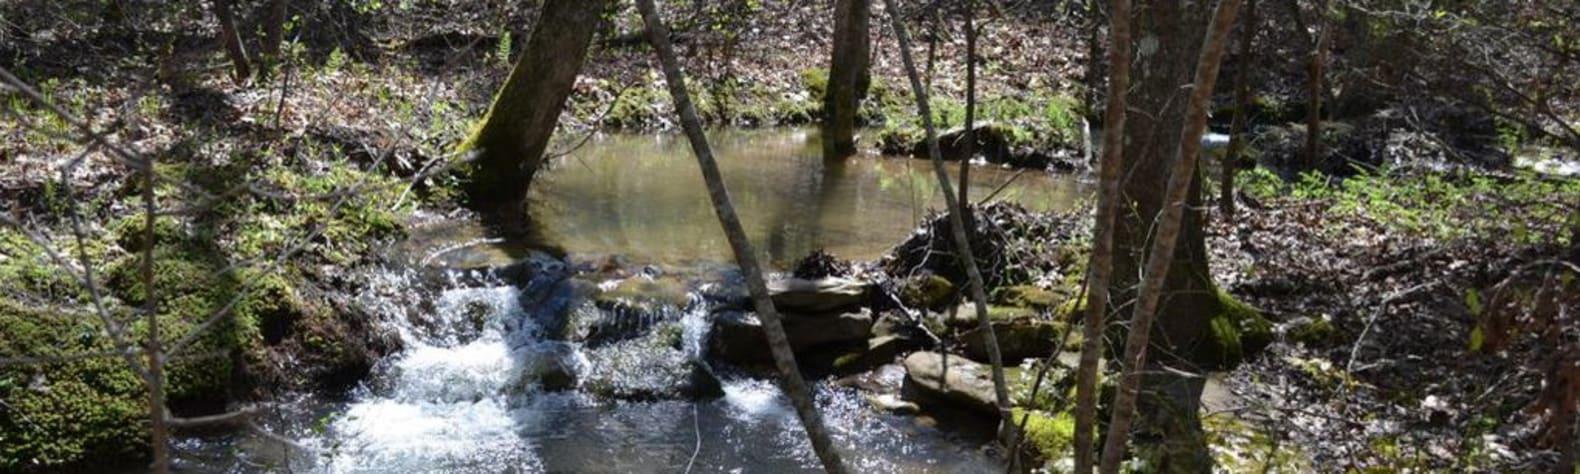 Gizzard Creek Farm